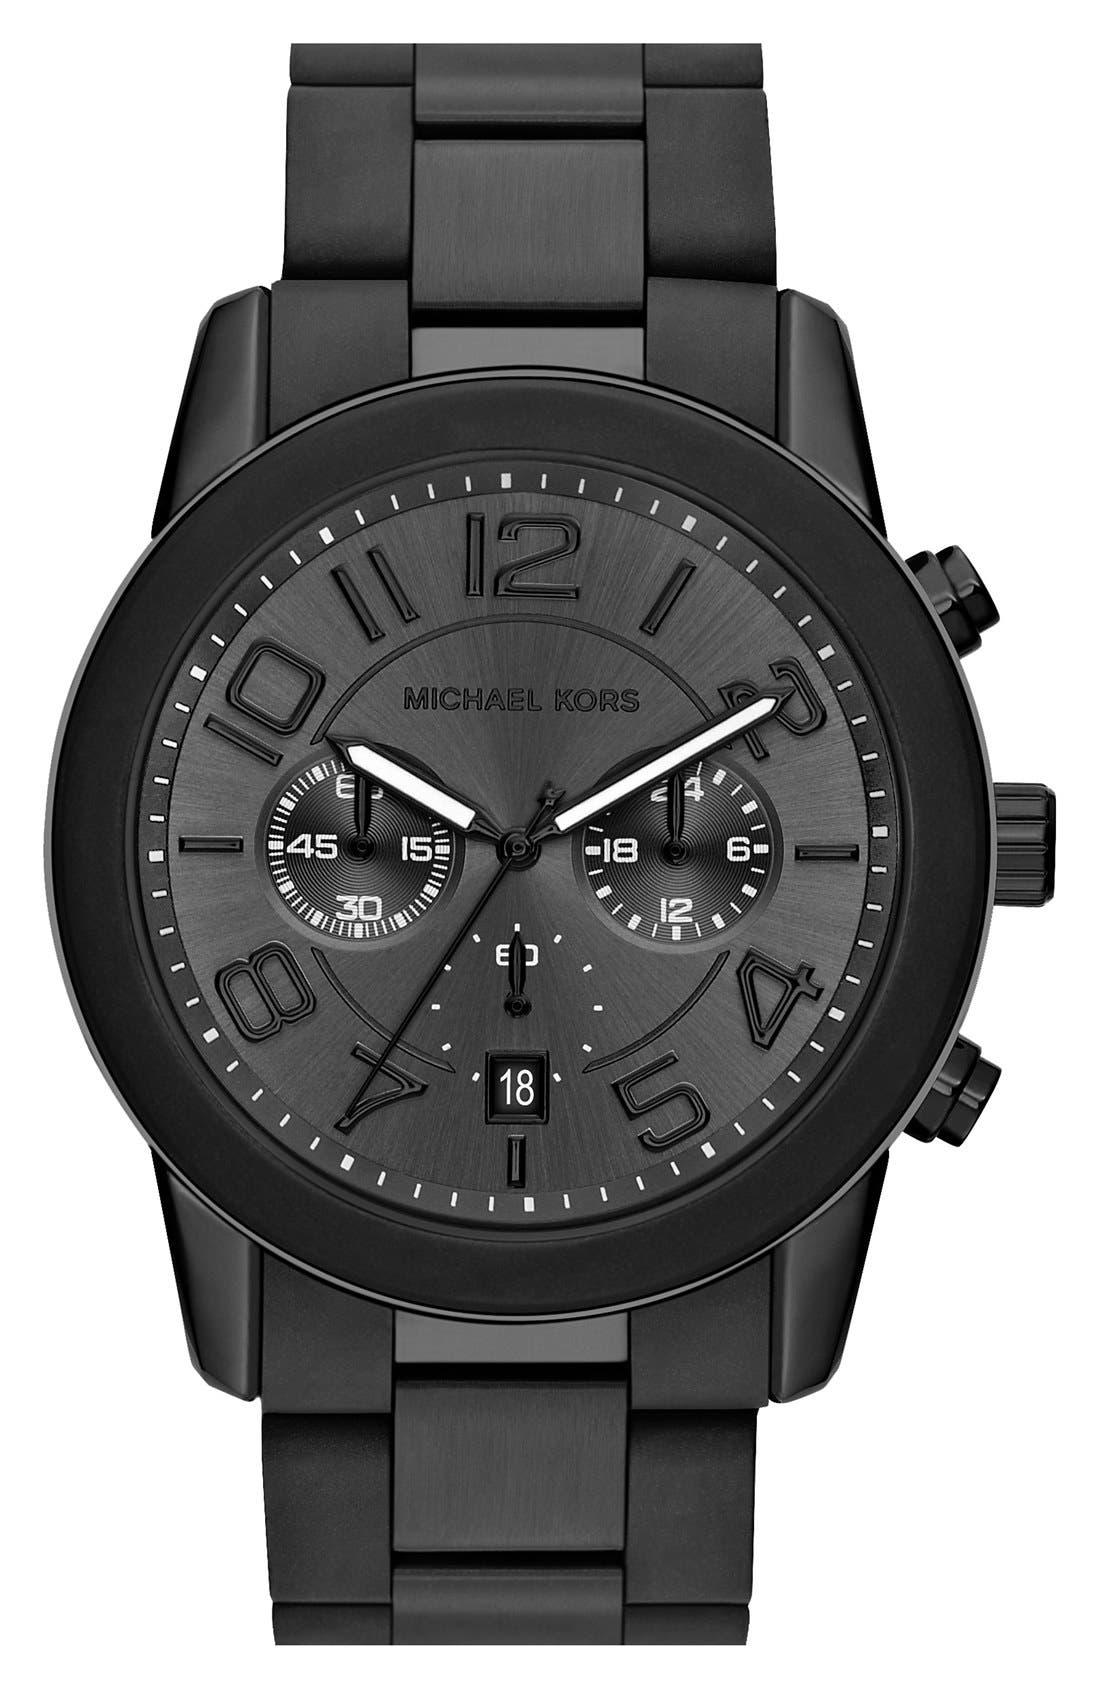 Main Image - Michael Kors 'Mercer' Chronograph Bracelet Watch, 45mm